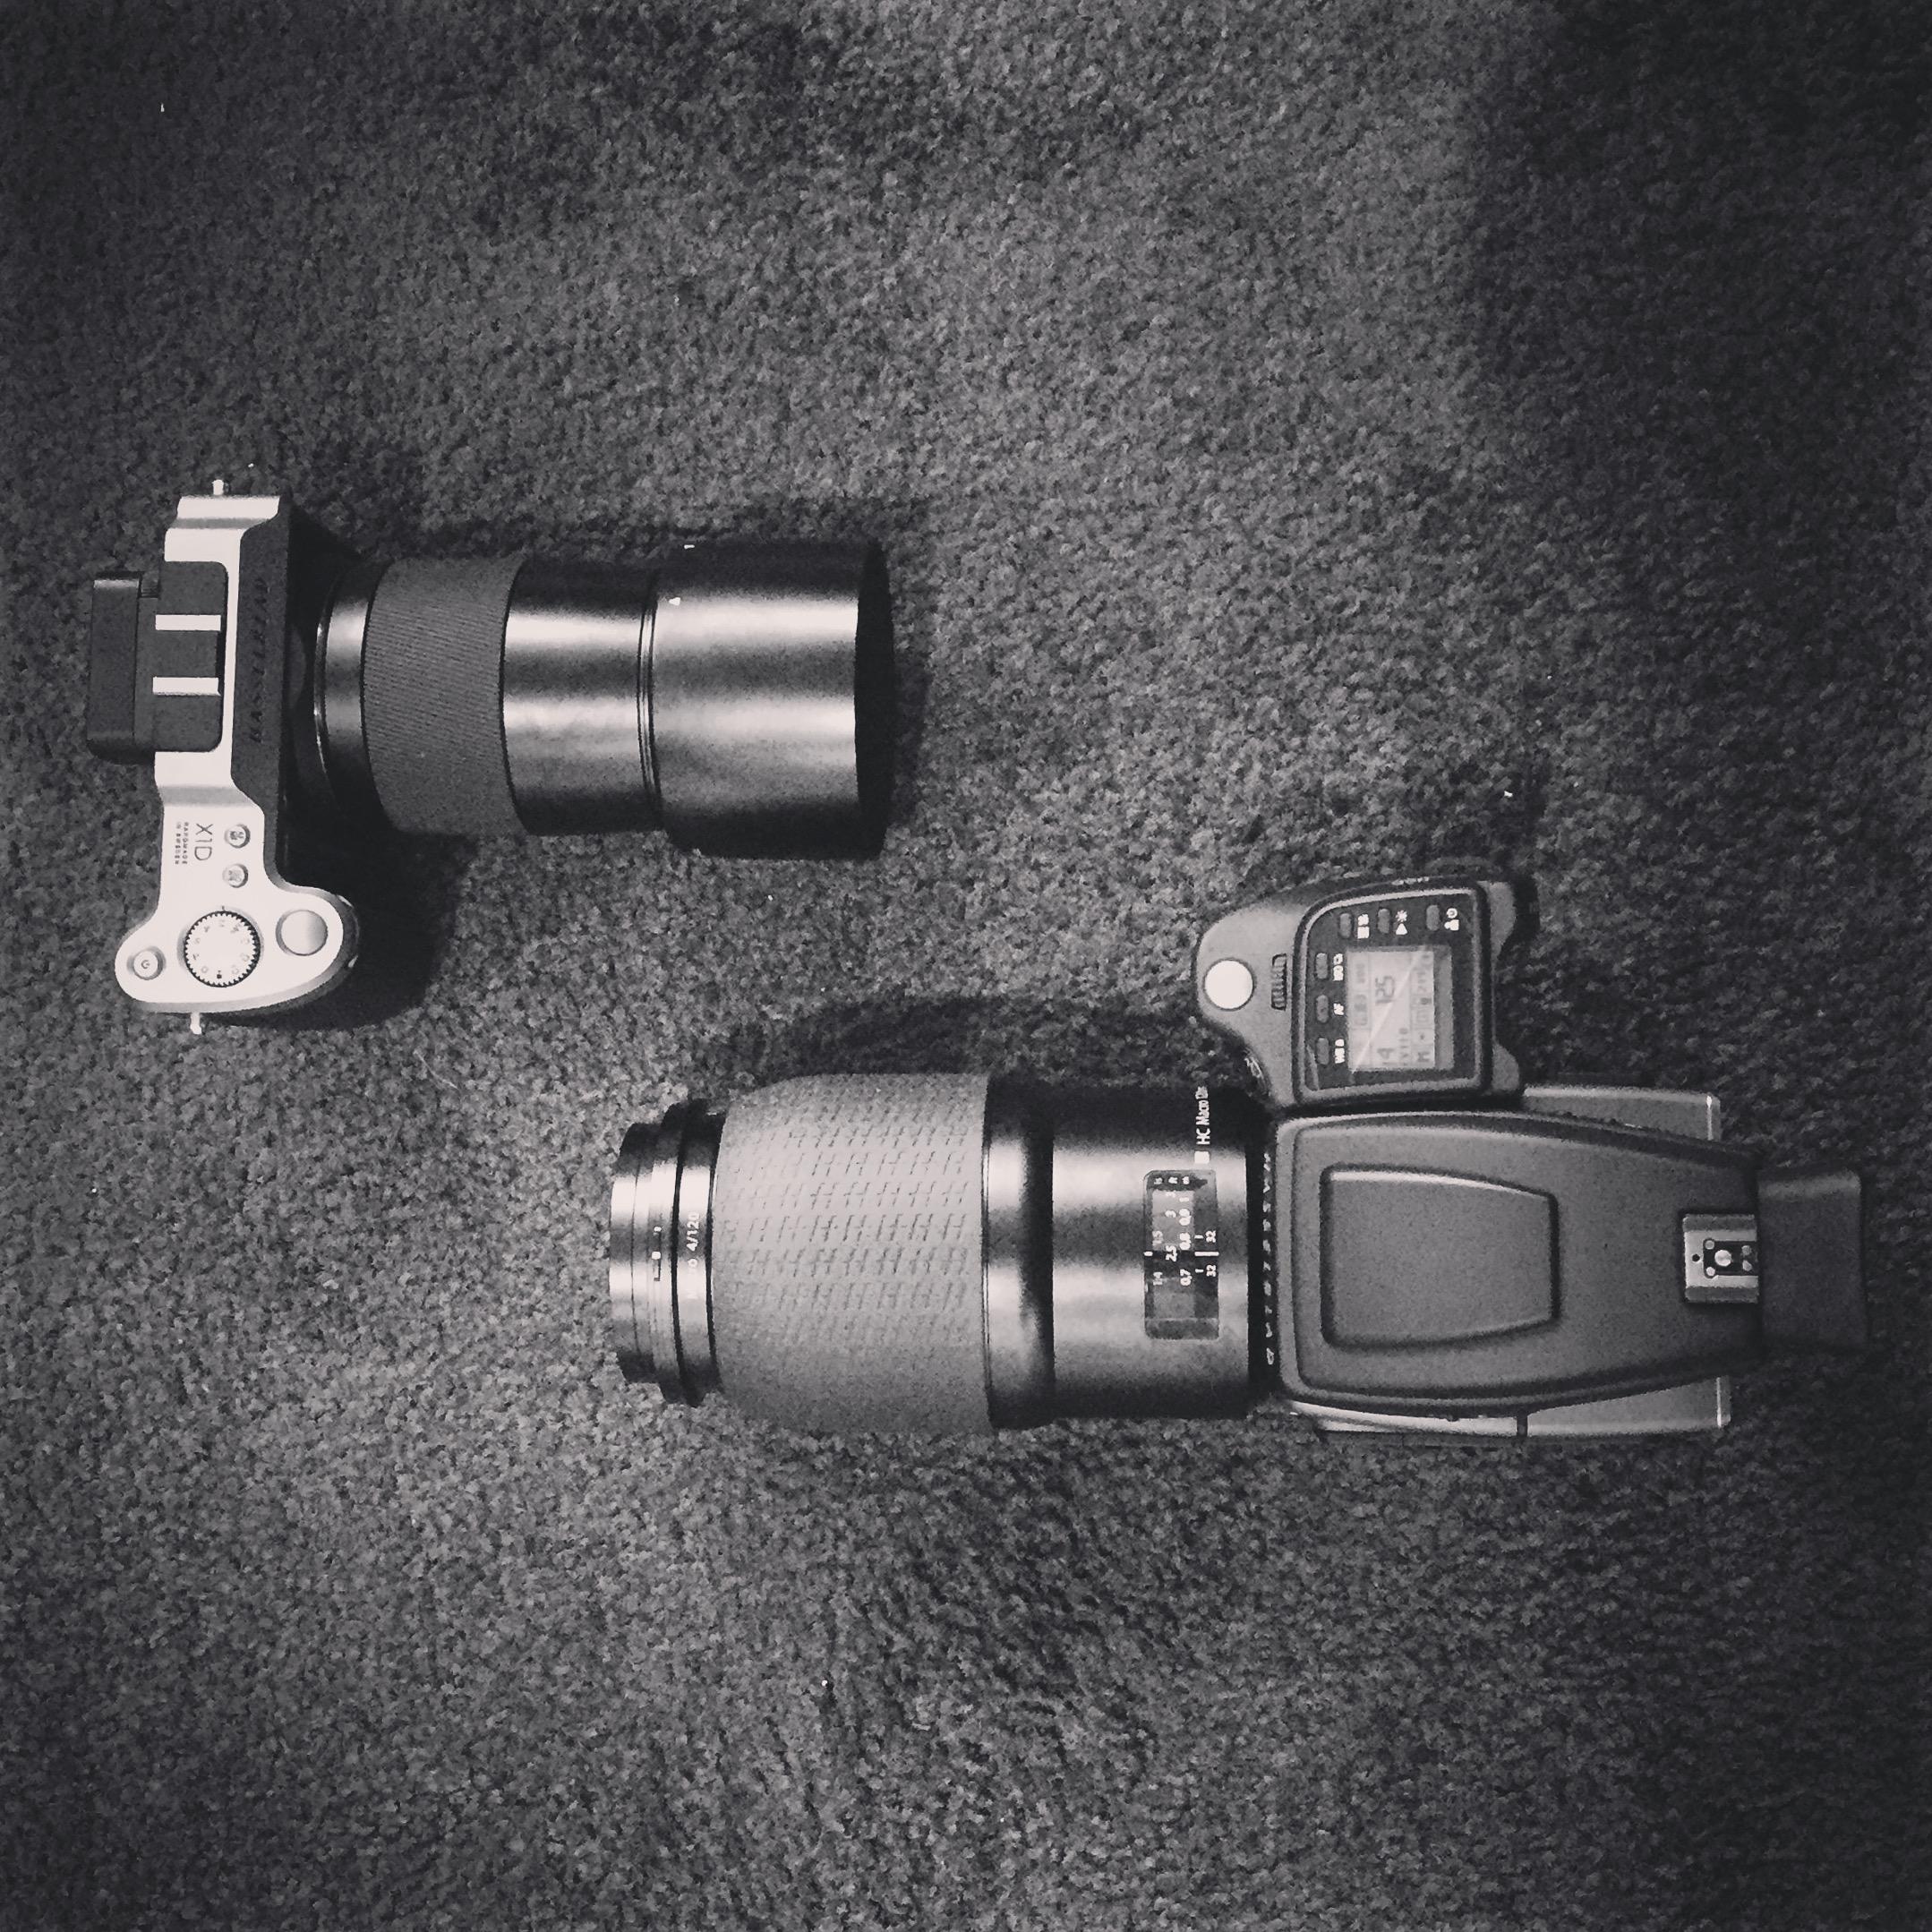 Top: Hasselblad X1D, Bottom: Hasselblad H6D-100C